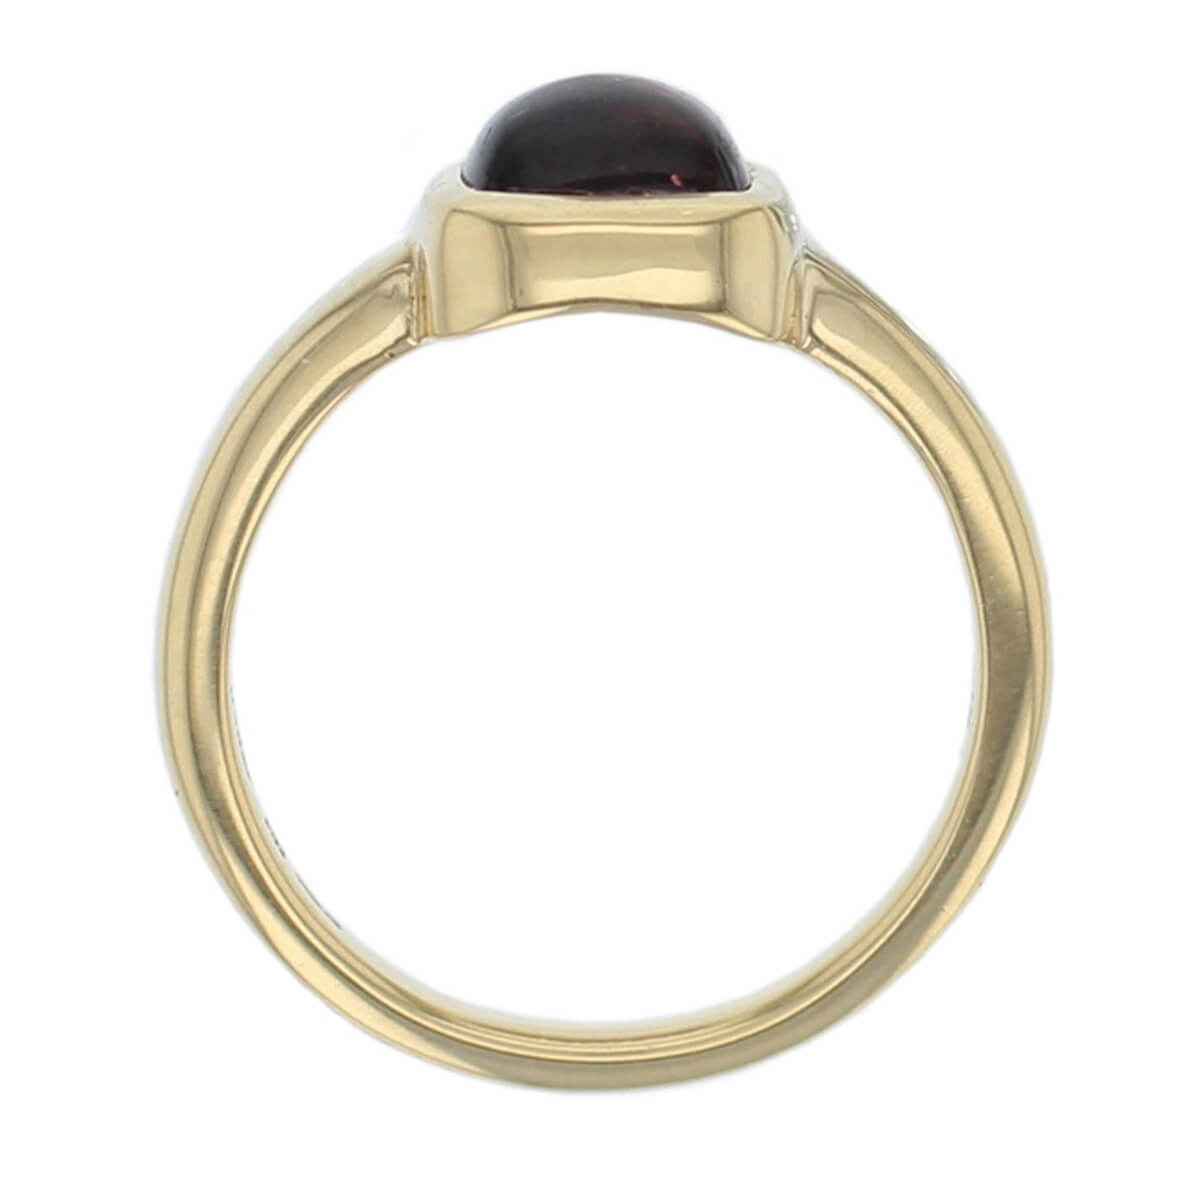 Kandy 18ct yellow gold yellow round pink tourmaline gemstone ladies dress ring, designer jewellery, gem, jewelry, handmade by Faller, Londonderry, Northern Ireland, Irish hand crafted